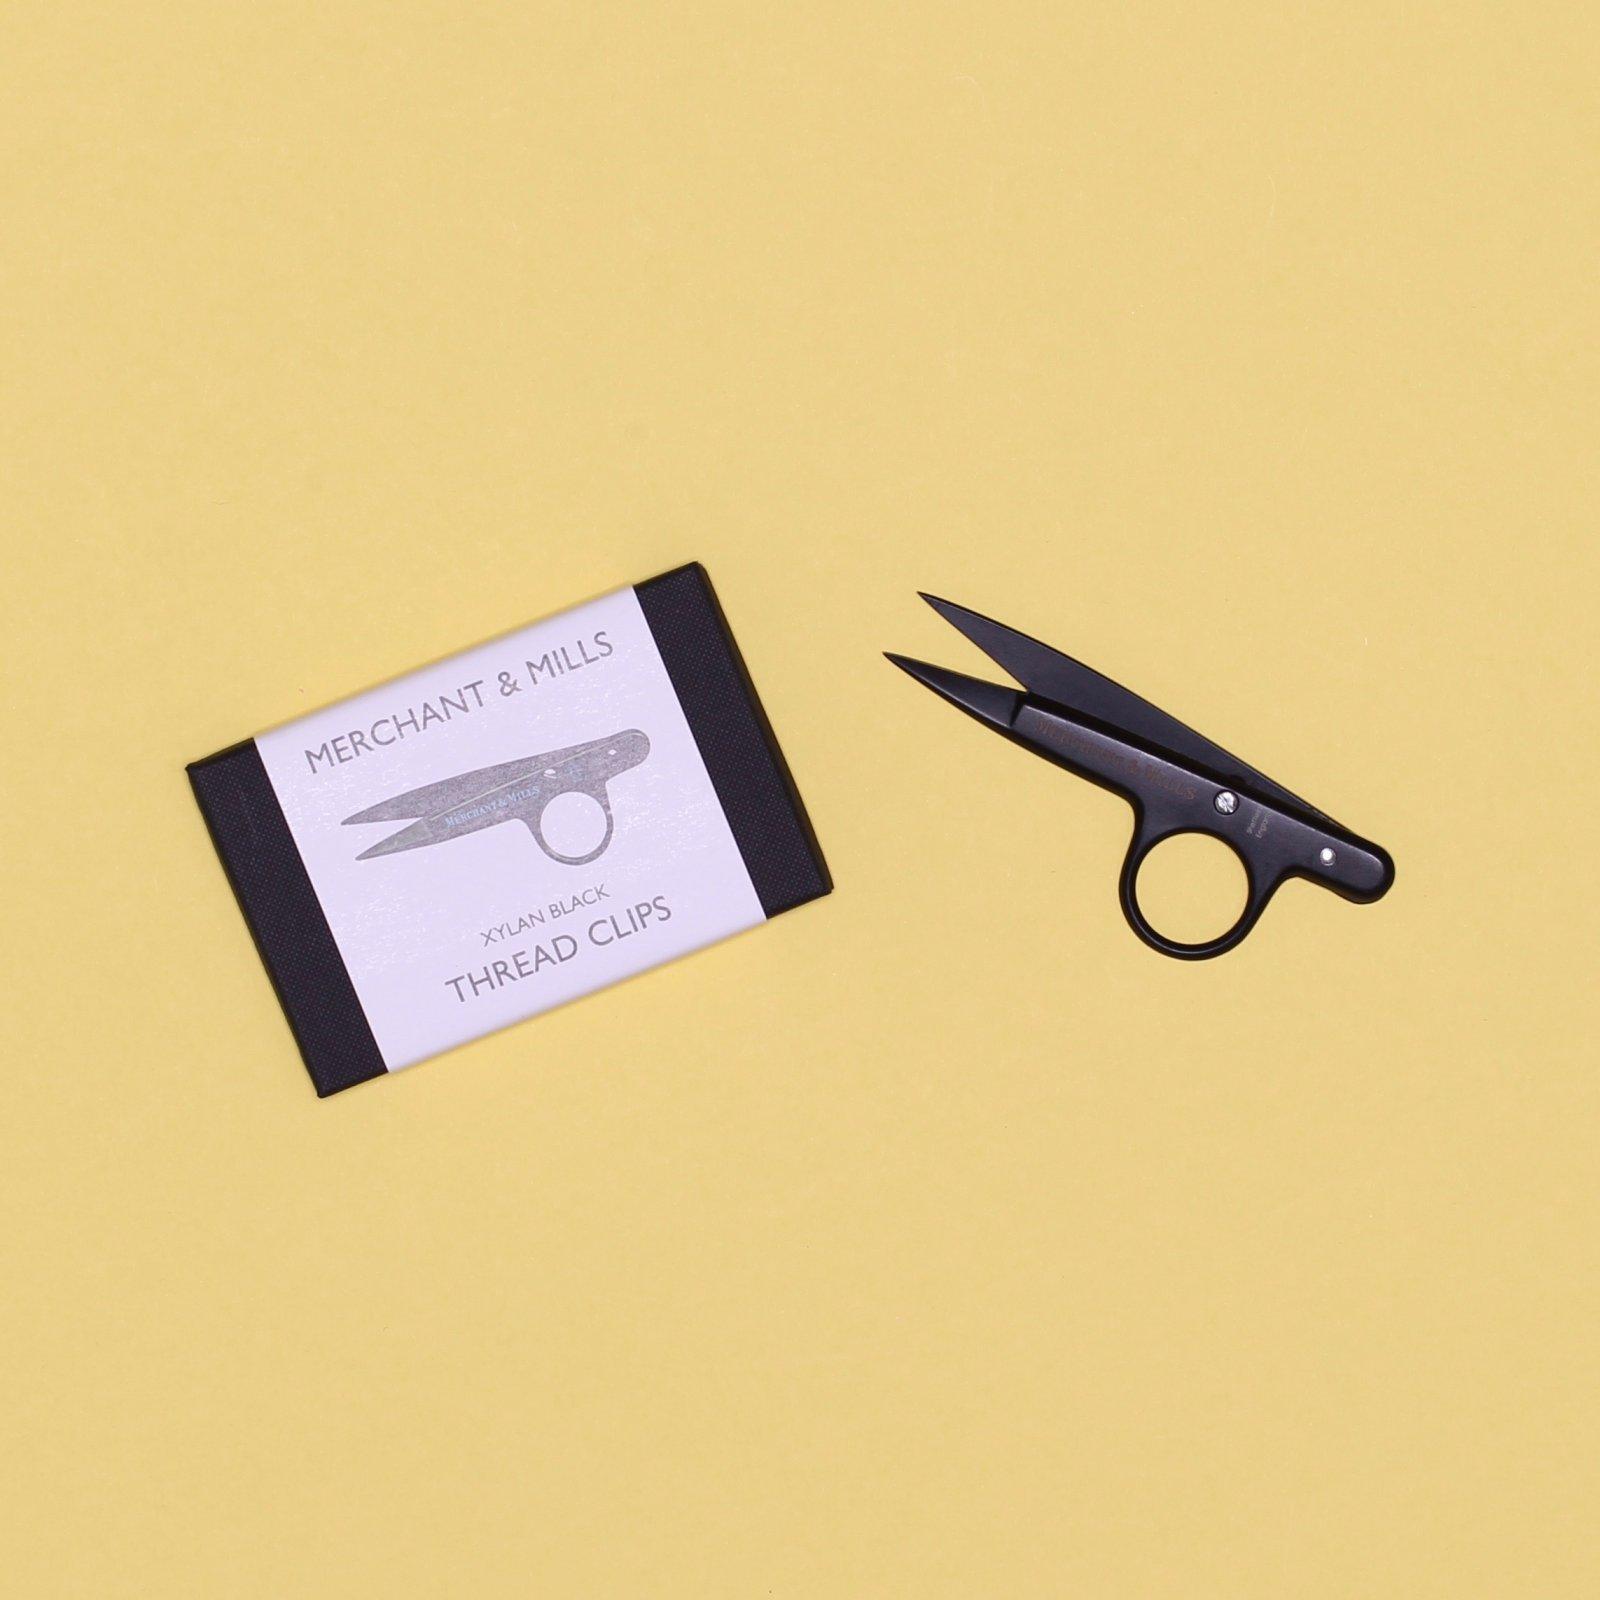 Merchant Mills Black Thread Clips - Sheffield Scissors